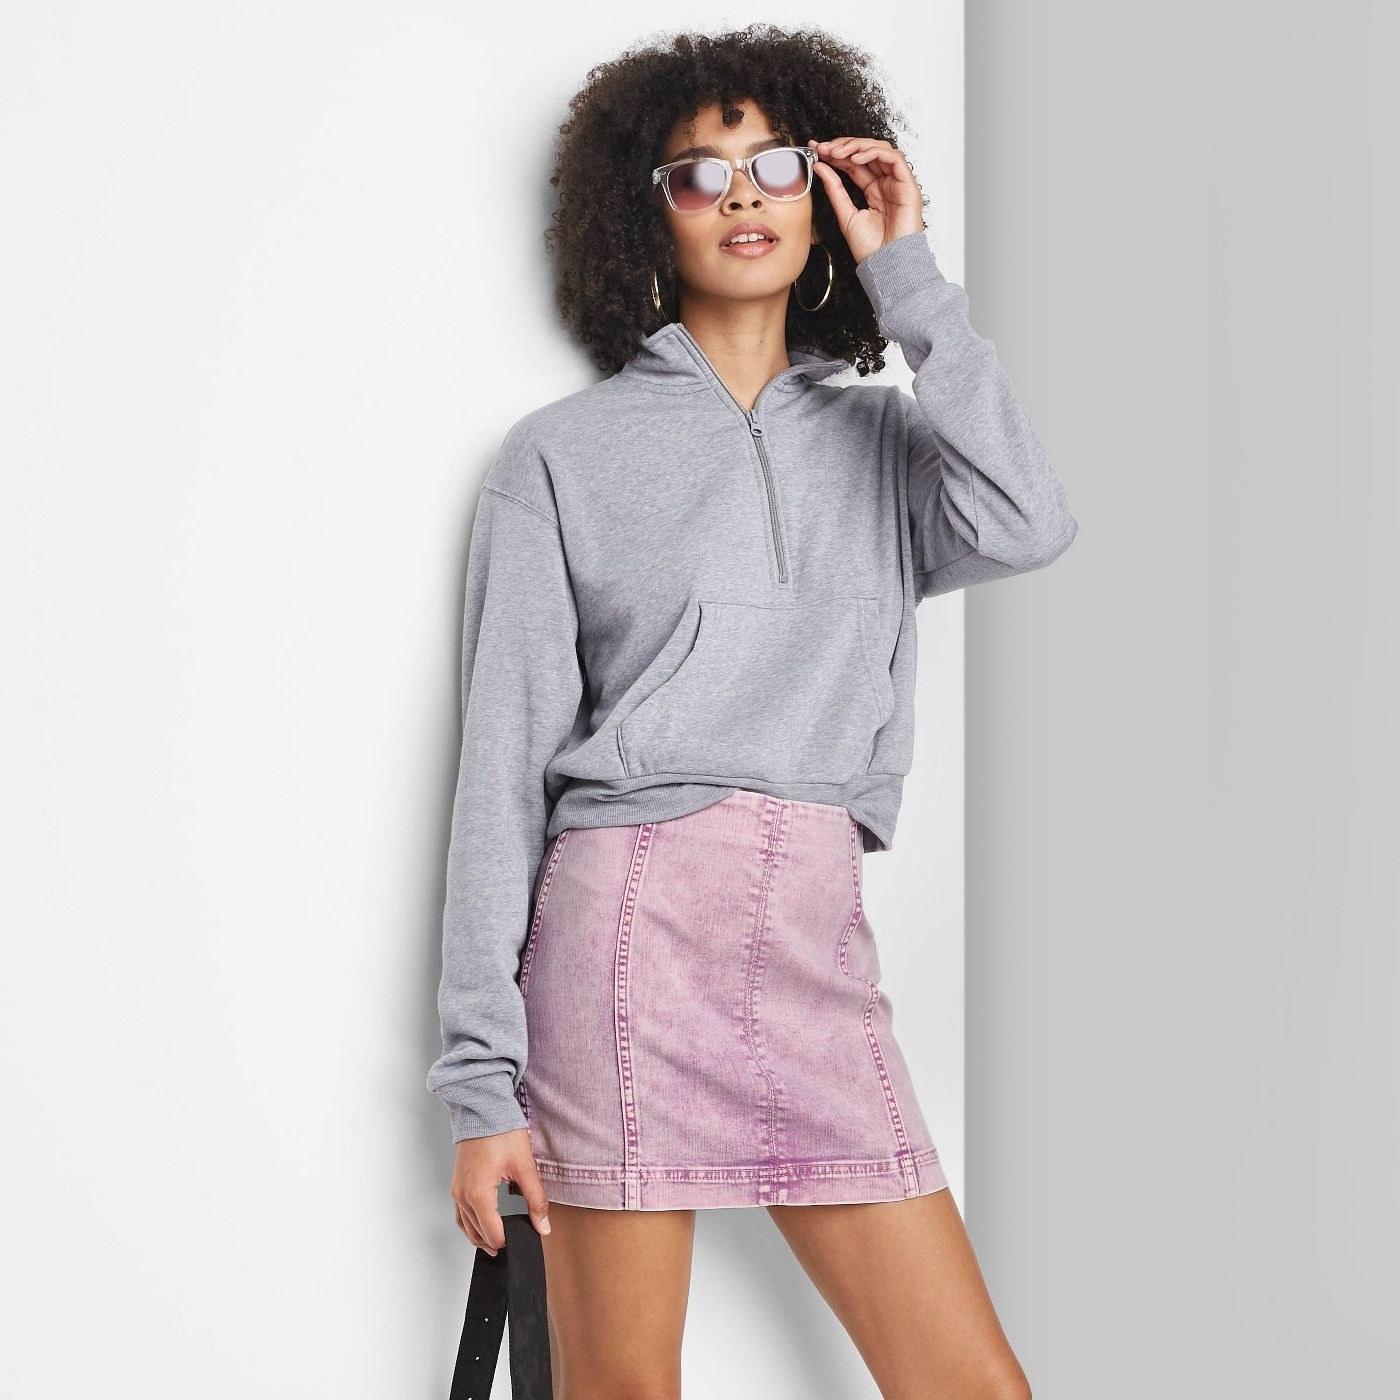 Model wearing pink seamed denim skirt, stops mid thigh